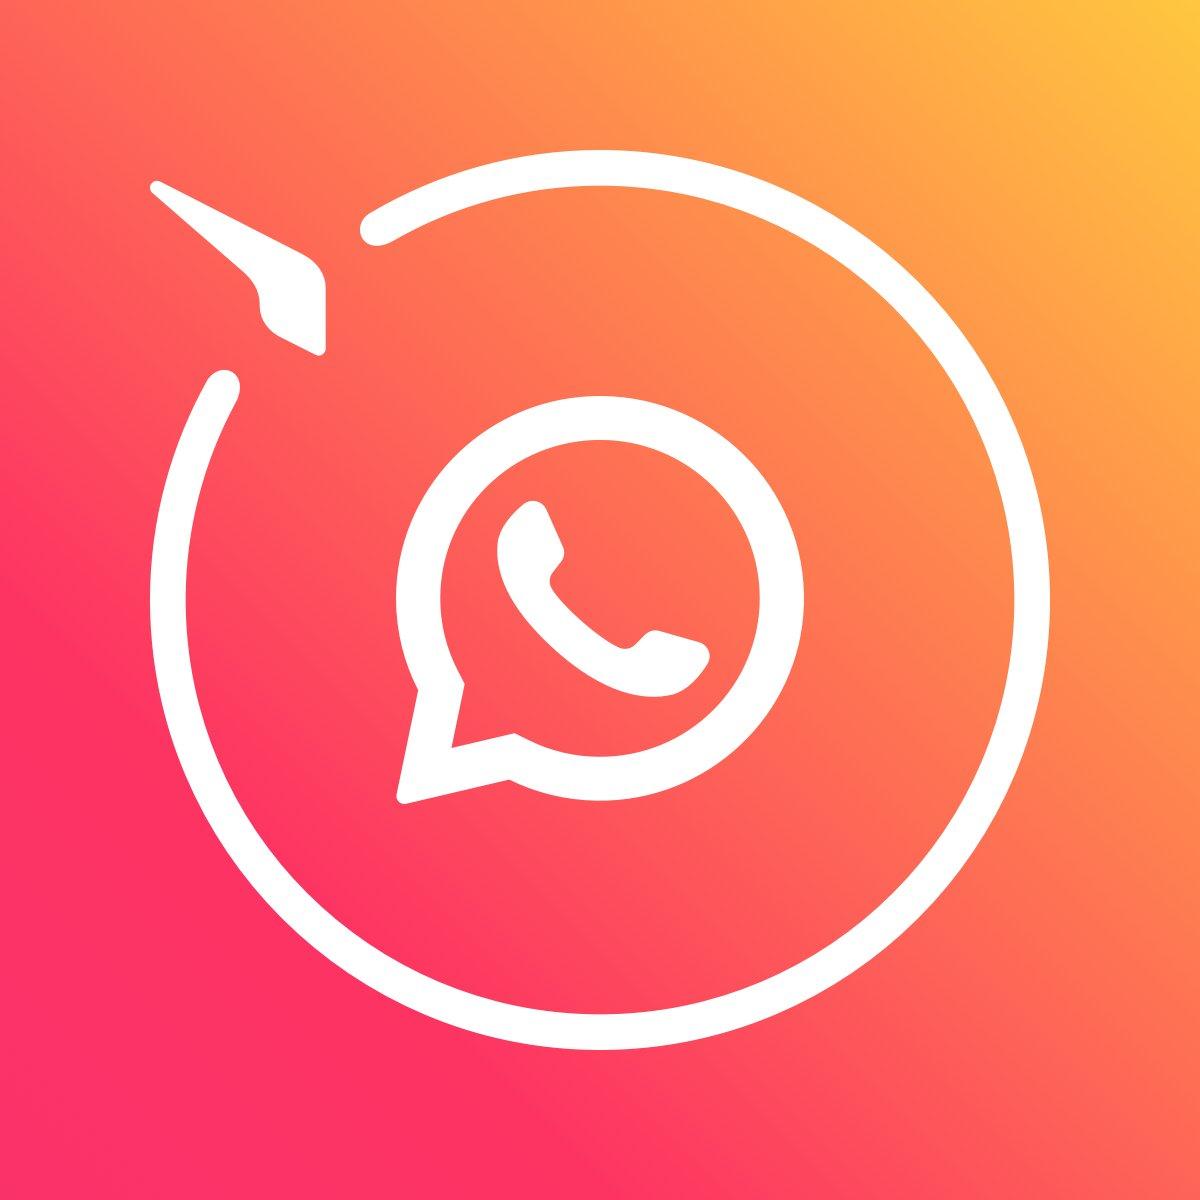 Shopify WhatsApp app by Elfsight